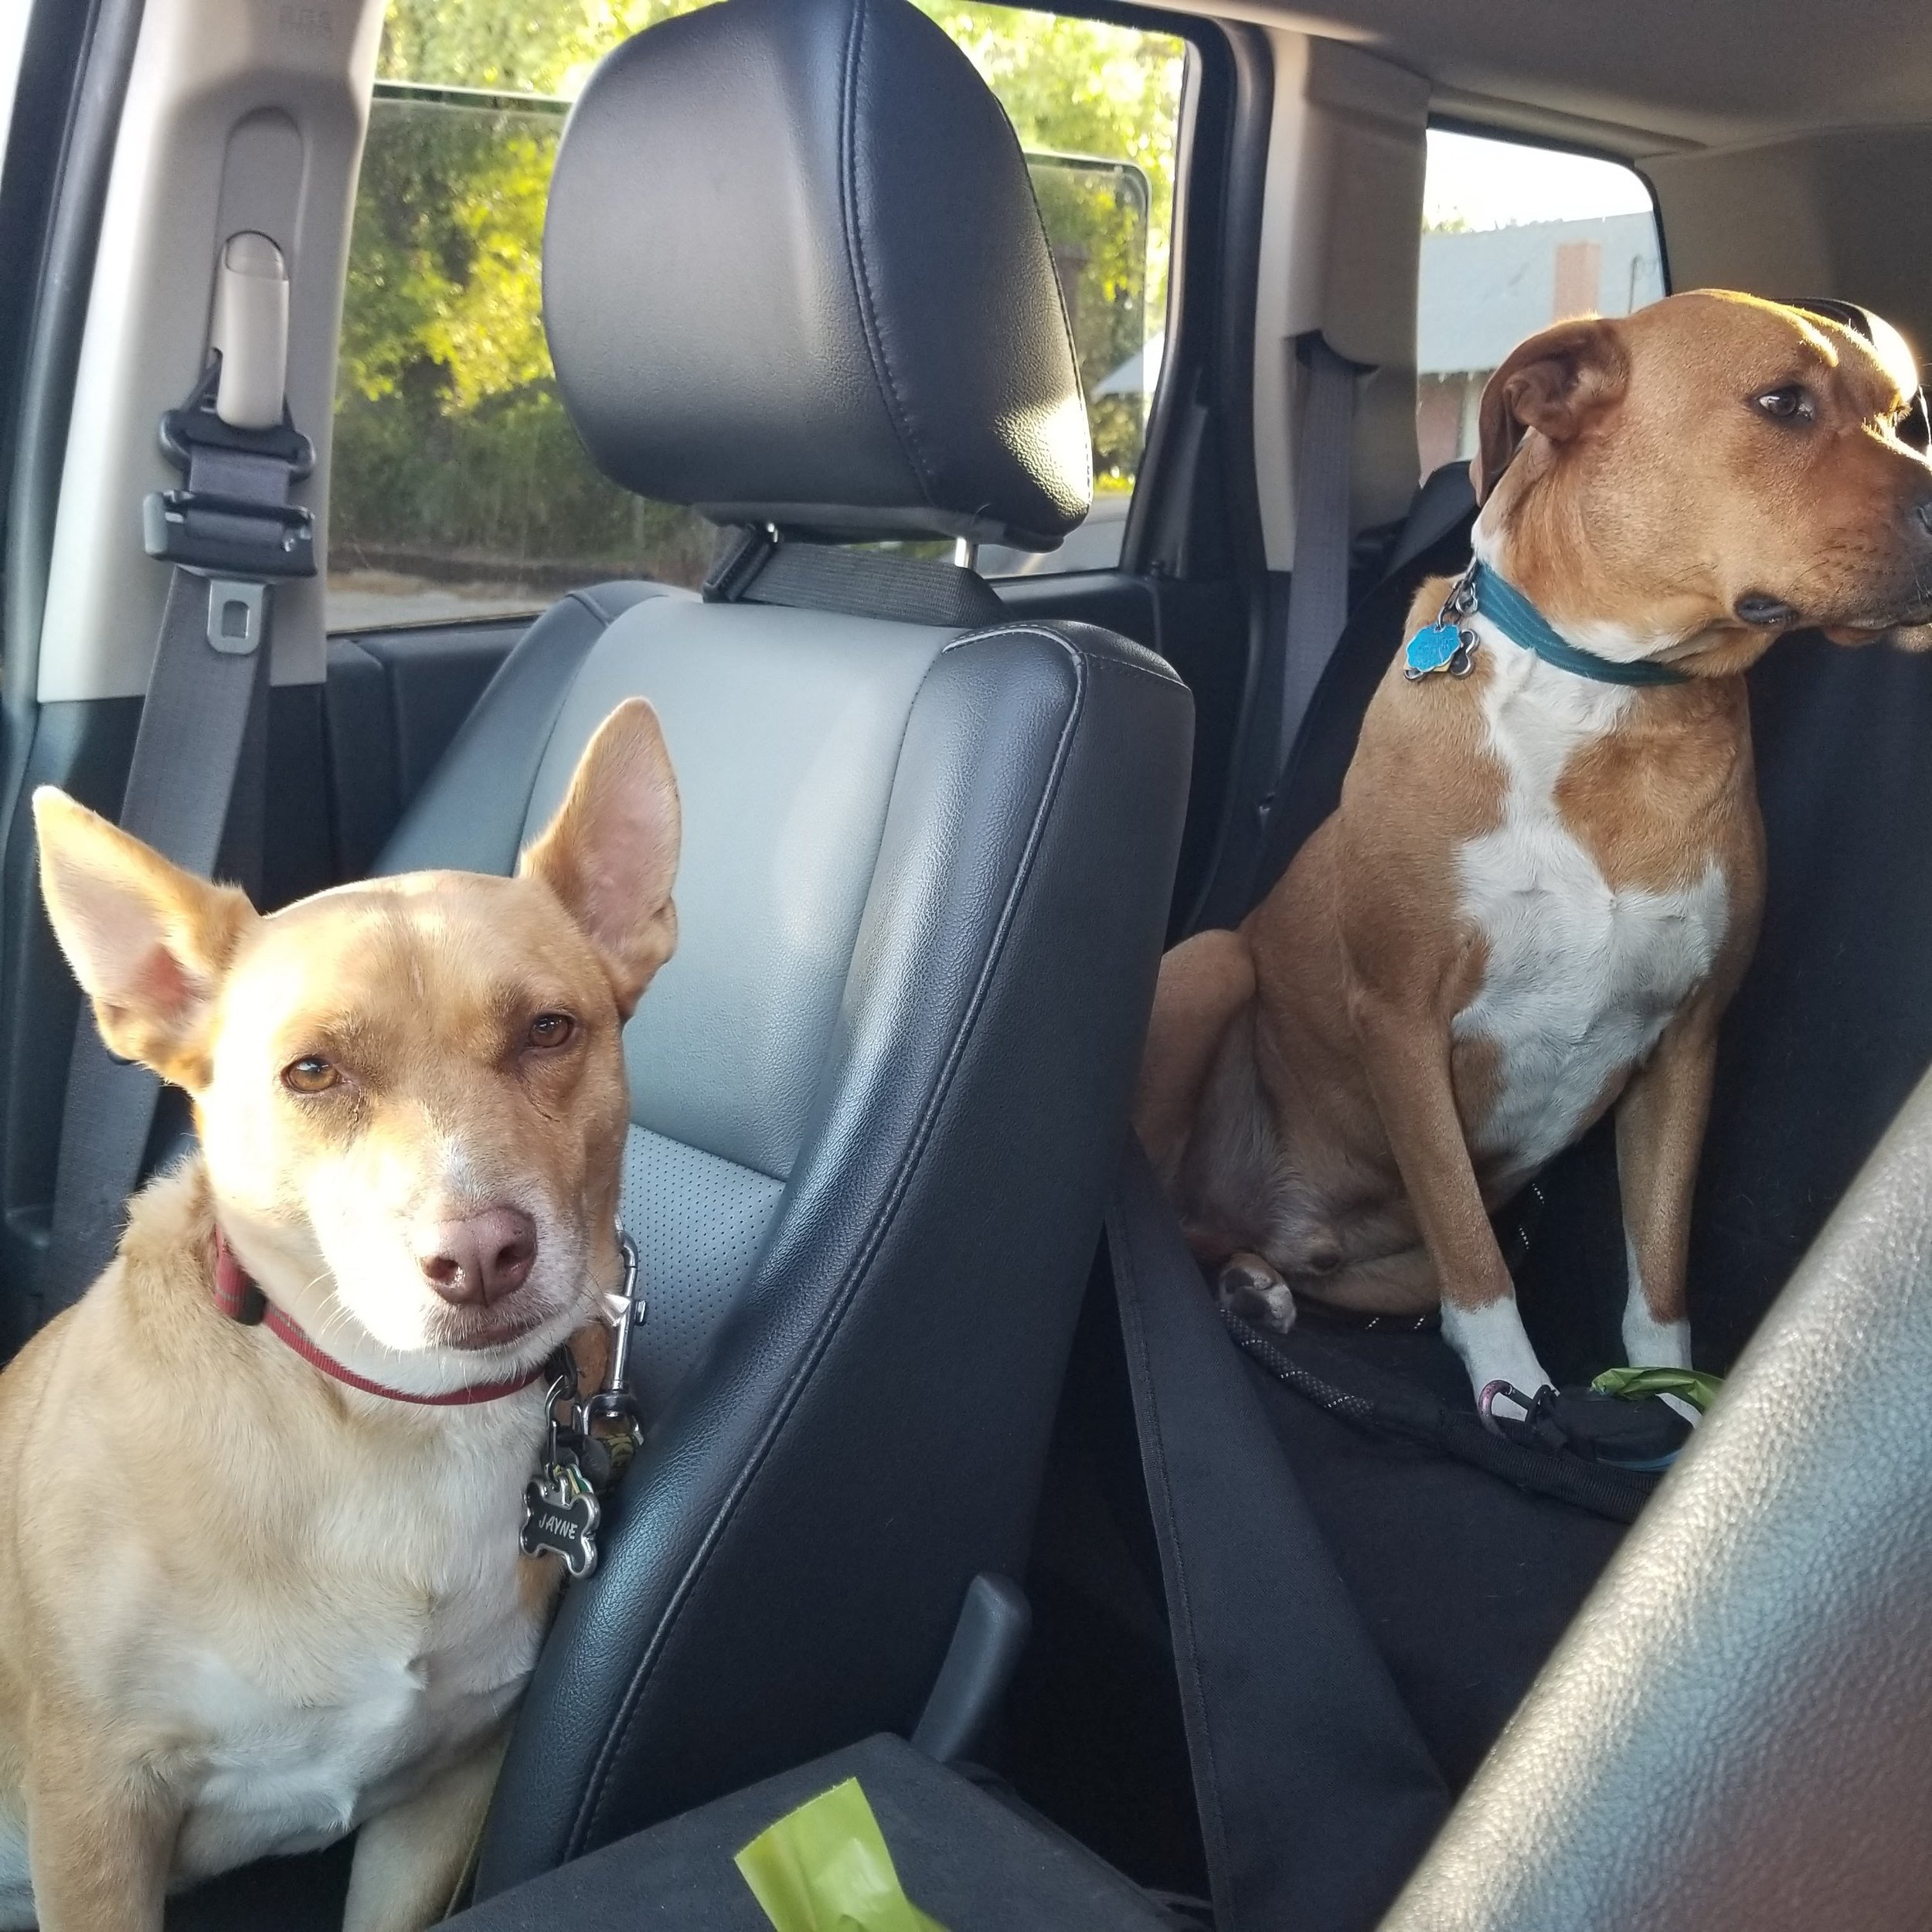 The pups enjoying a nice ride around in Waverly aka my Jeep.